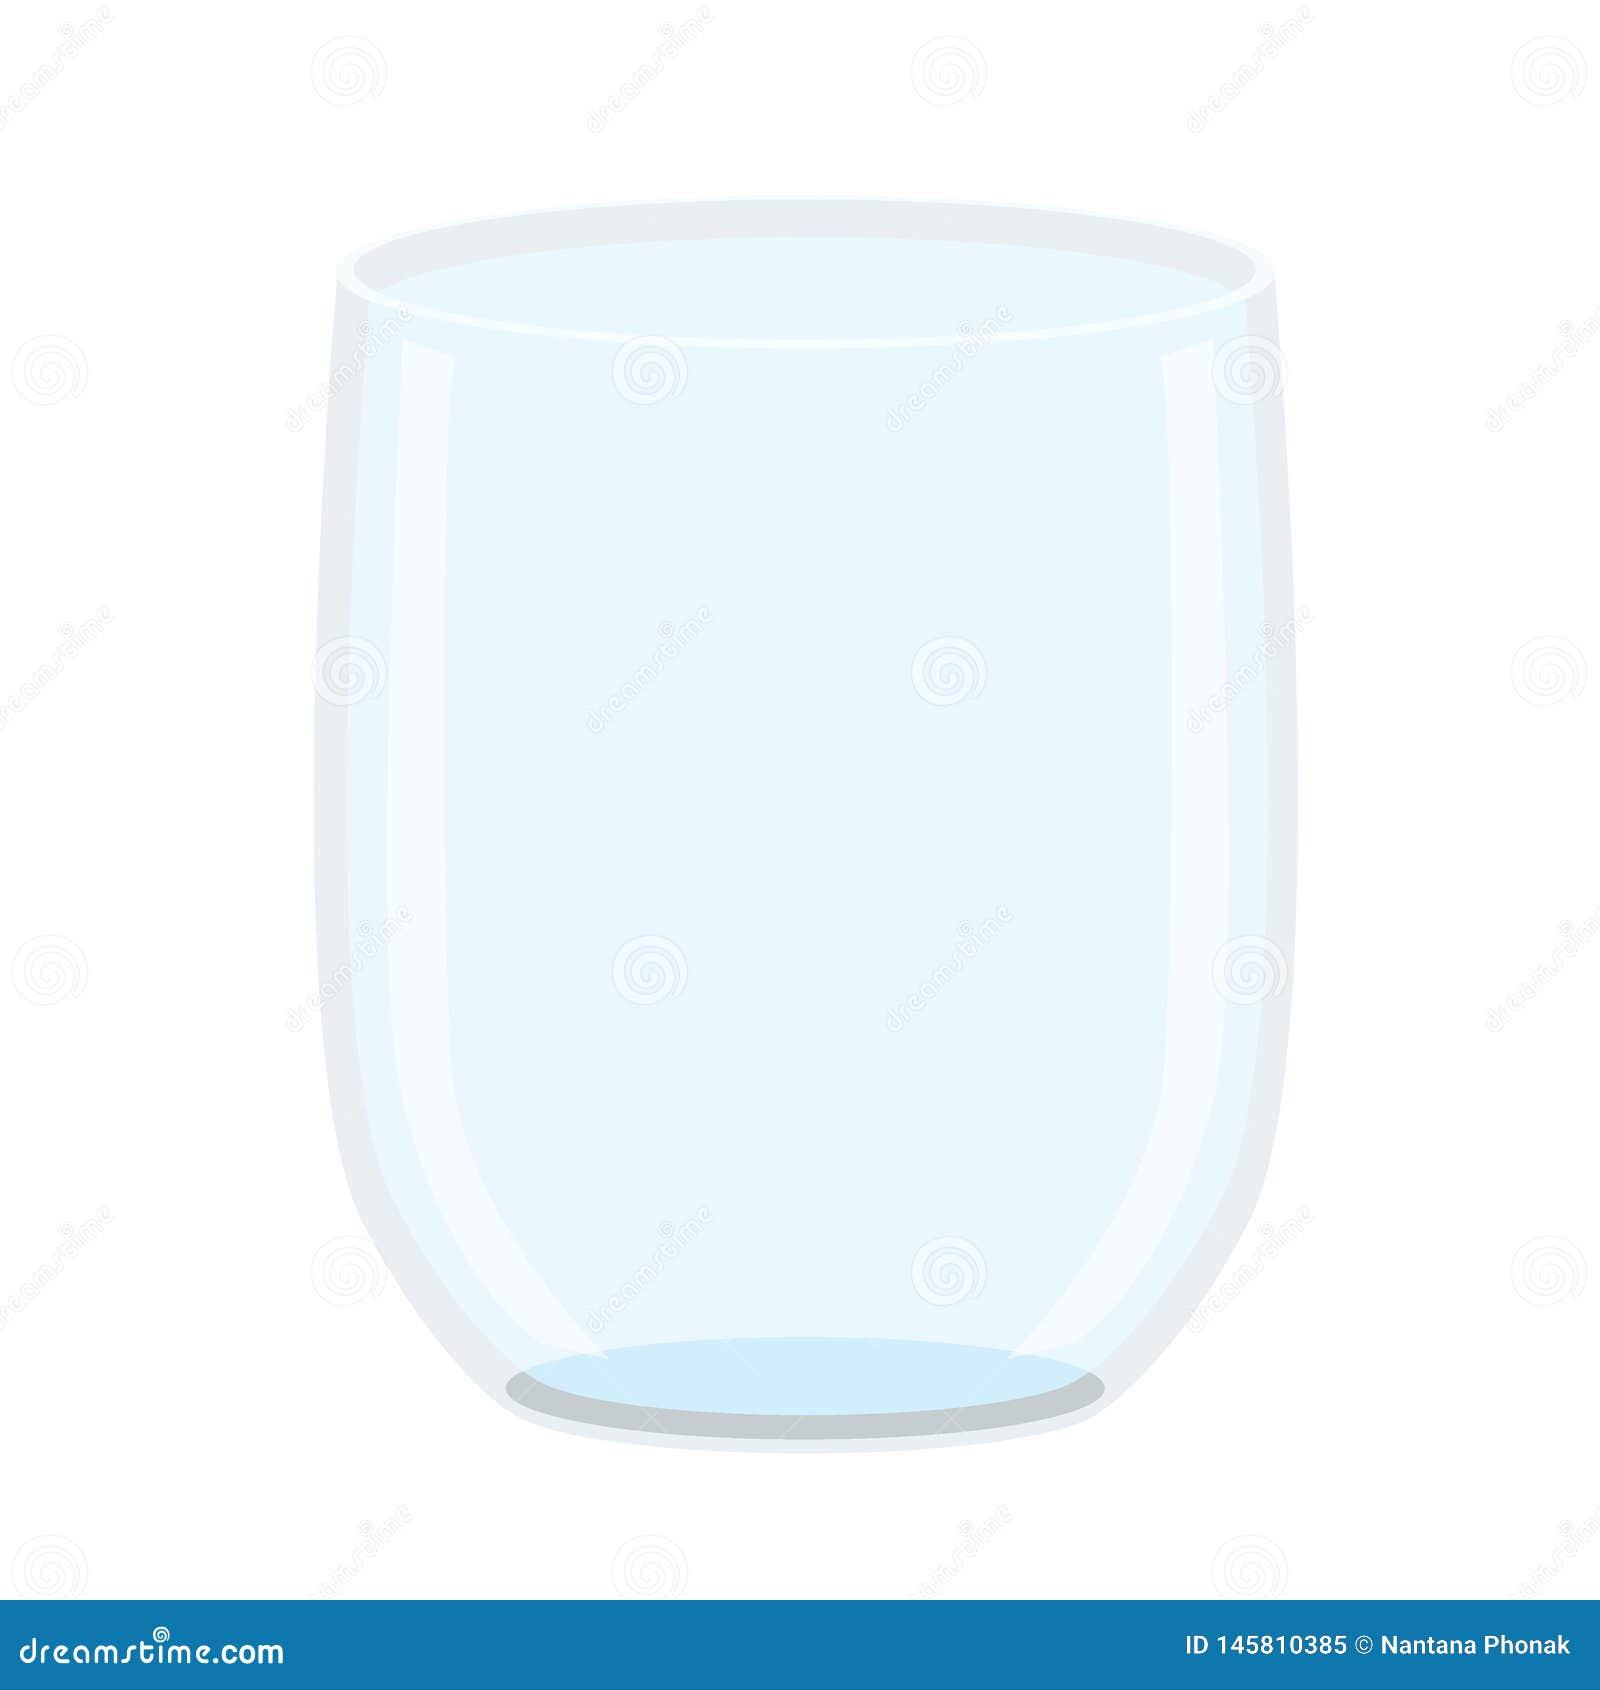 Agua potable de cristal vac?a en el vector blanco del ejemplo del fondo